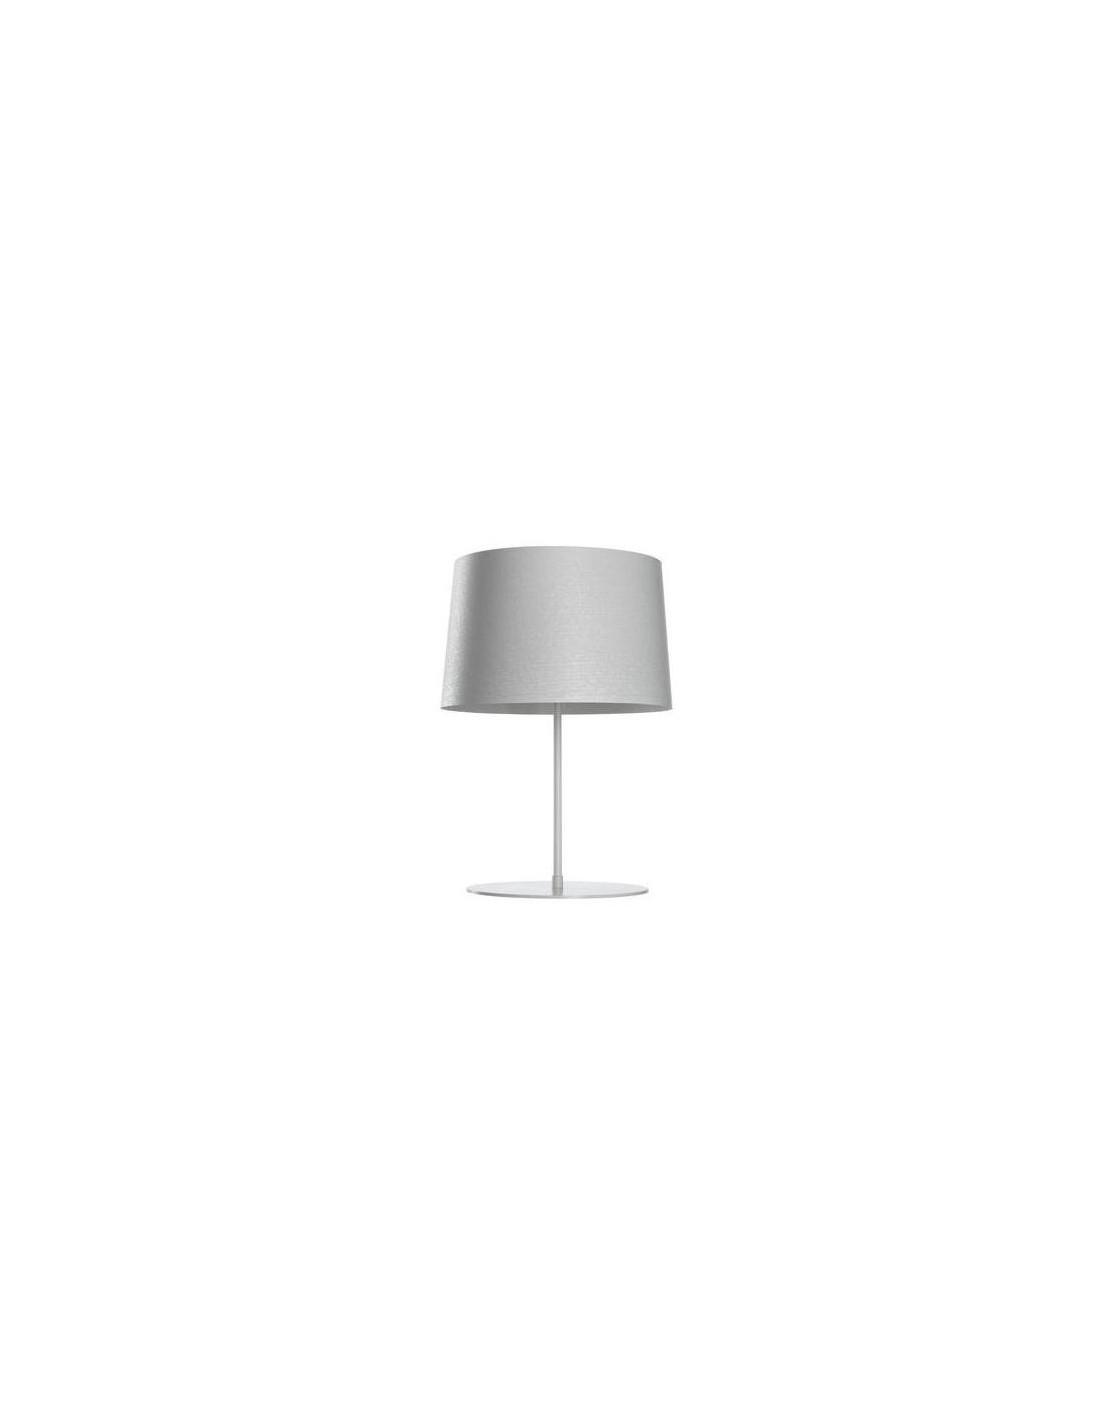 TWIGGY XL - lampe à poser foscarini blanc